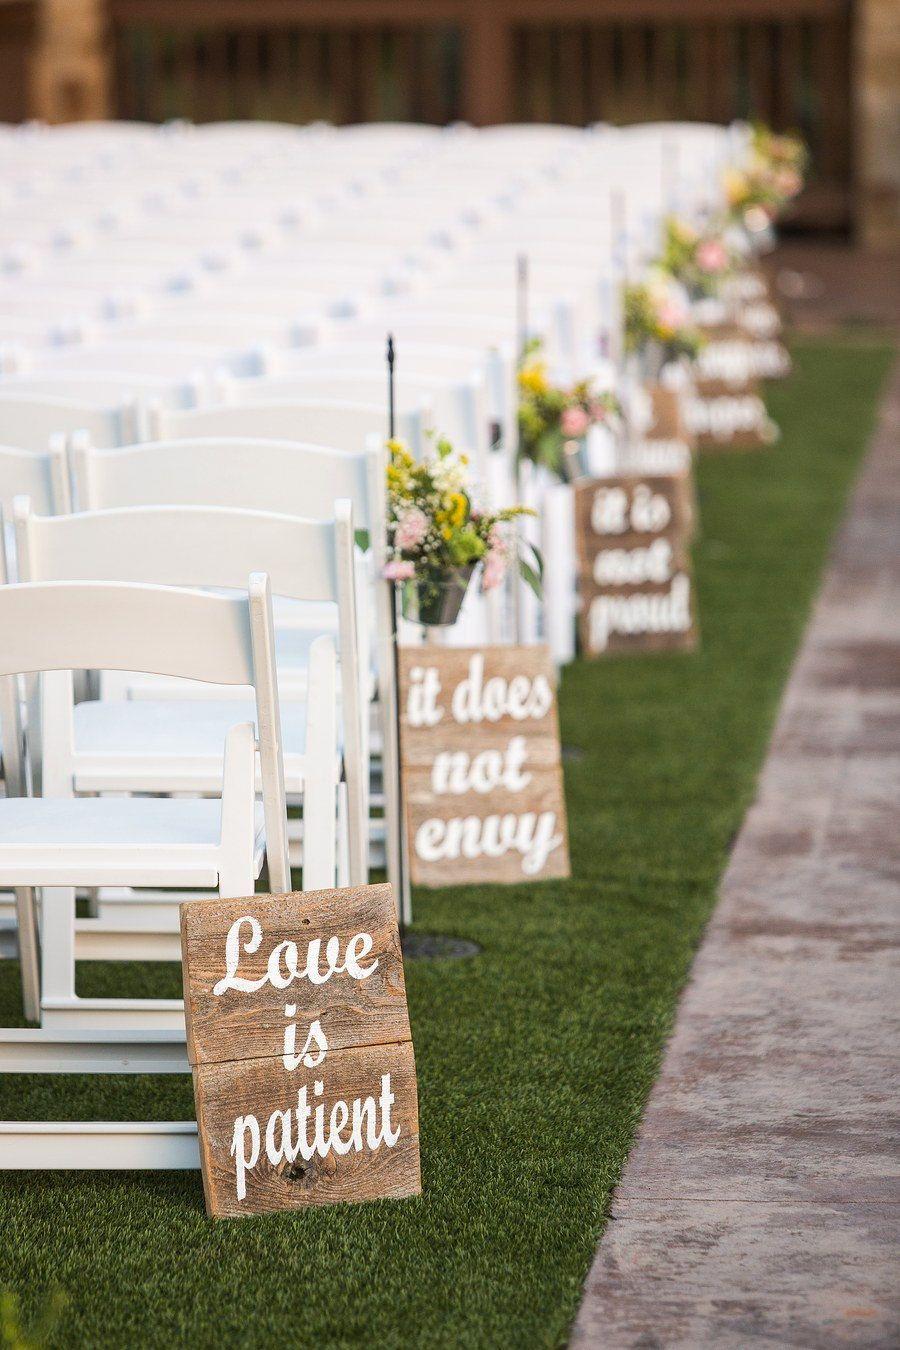 10 Gorgeous Wedding Signs We Love on Etsy | DIY Wedding | Pinterest ...